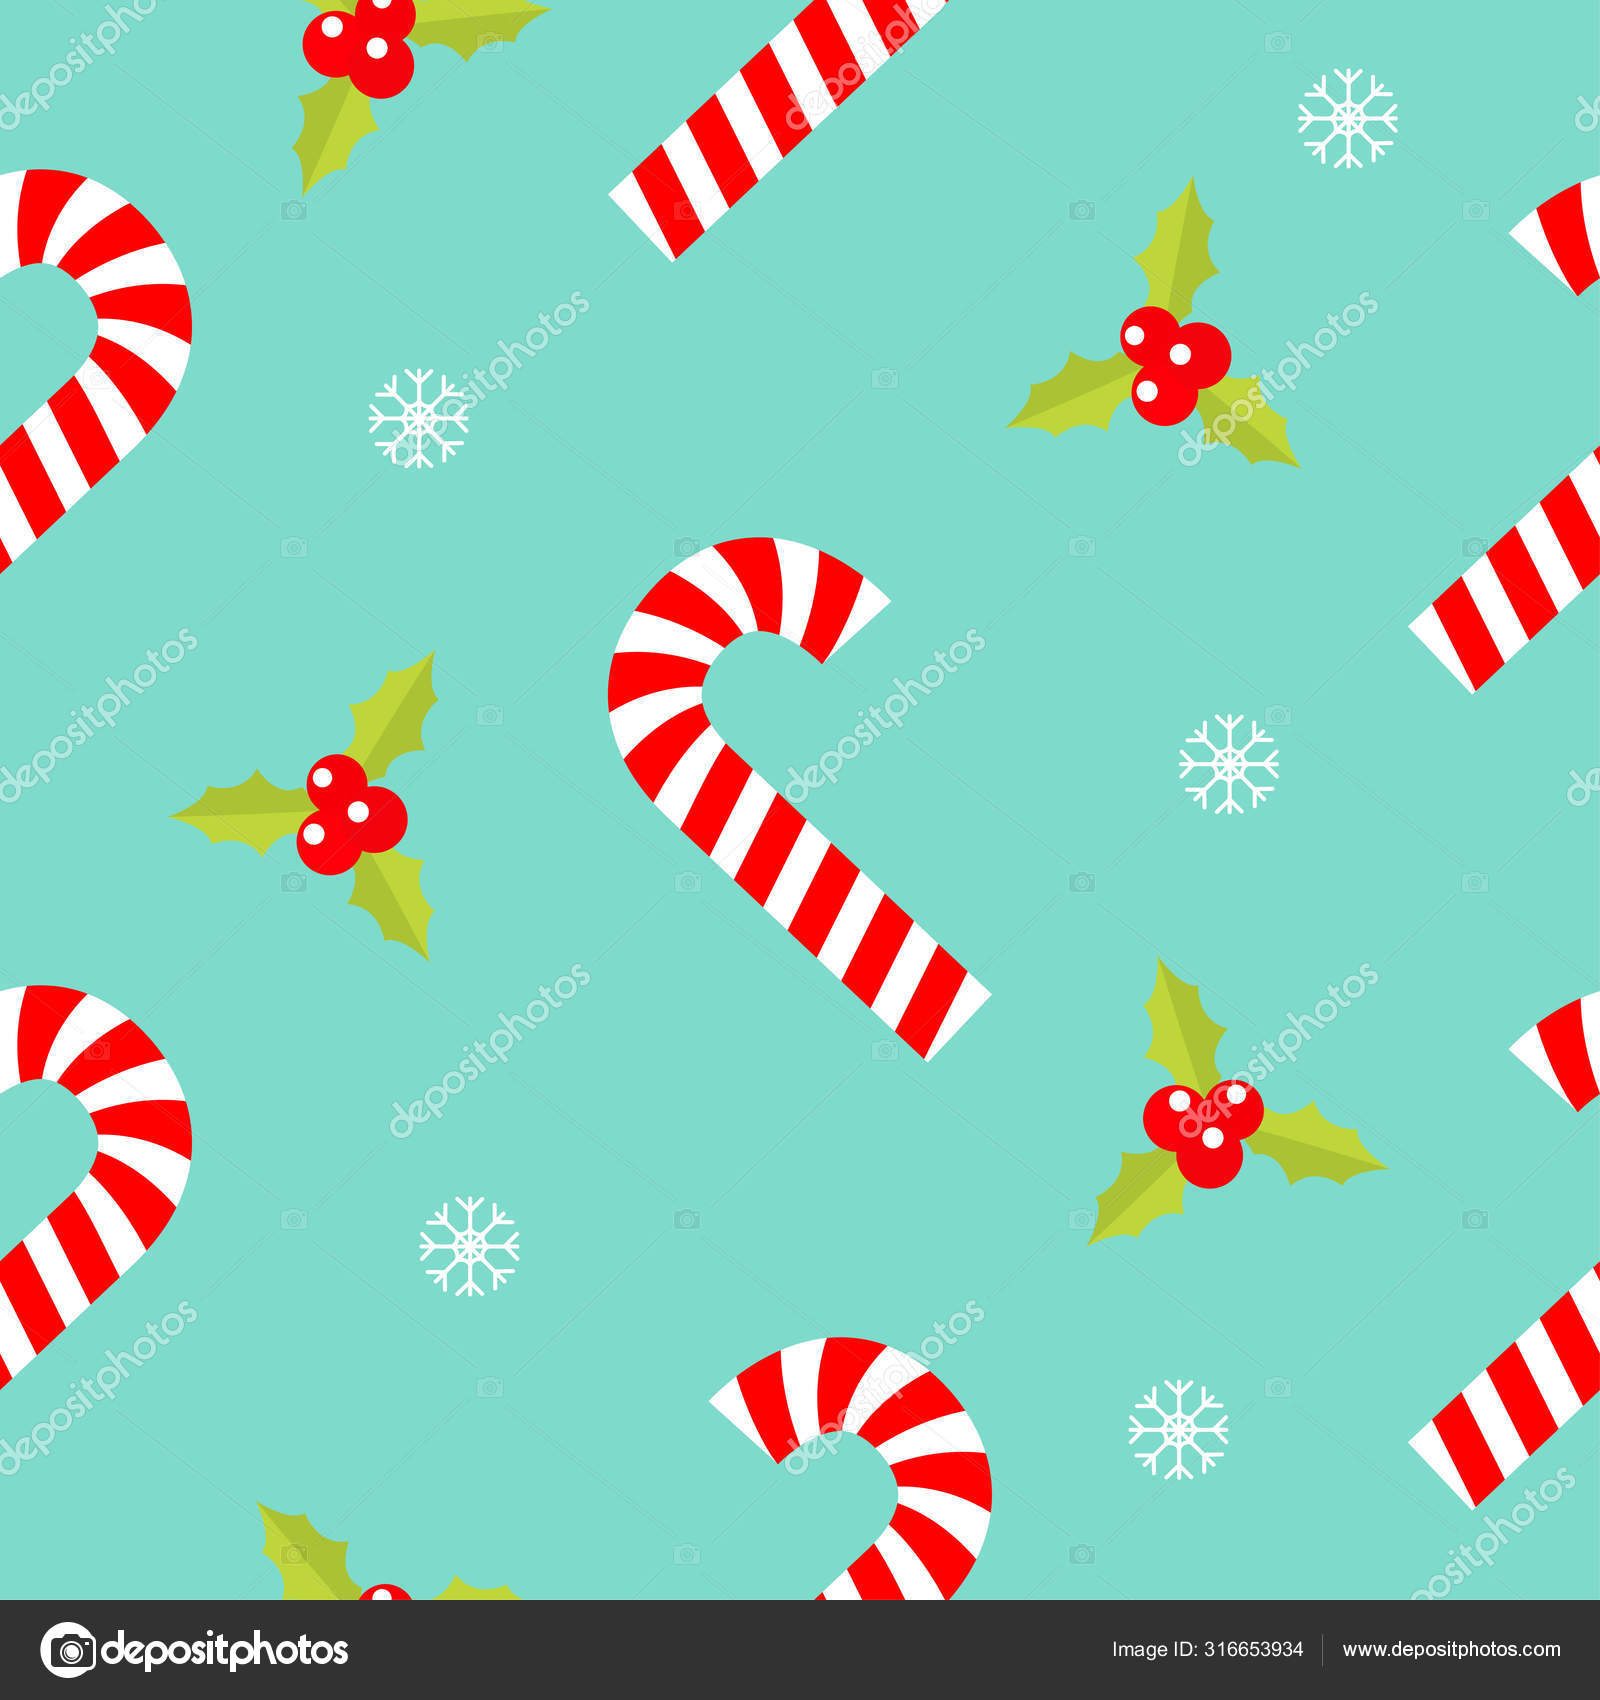 depositphotos 316653934 stock illustration merry christmas seamless pattern candy